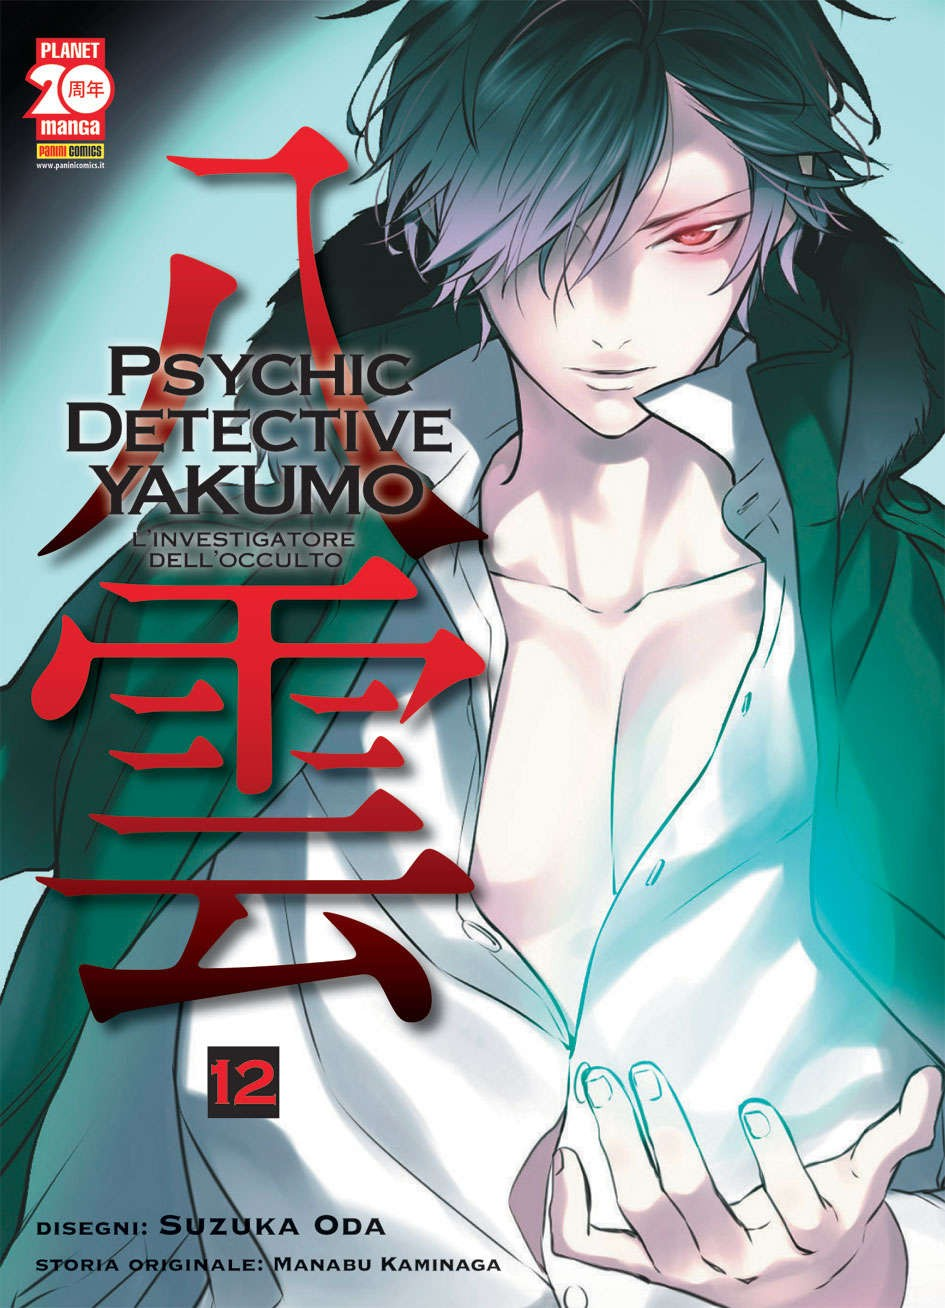 Psychic Detective Yakumo - N° 12 - L'Investigatore Dell'Occulto - Manga Mystery Planet Manga